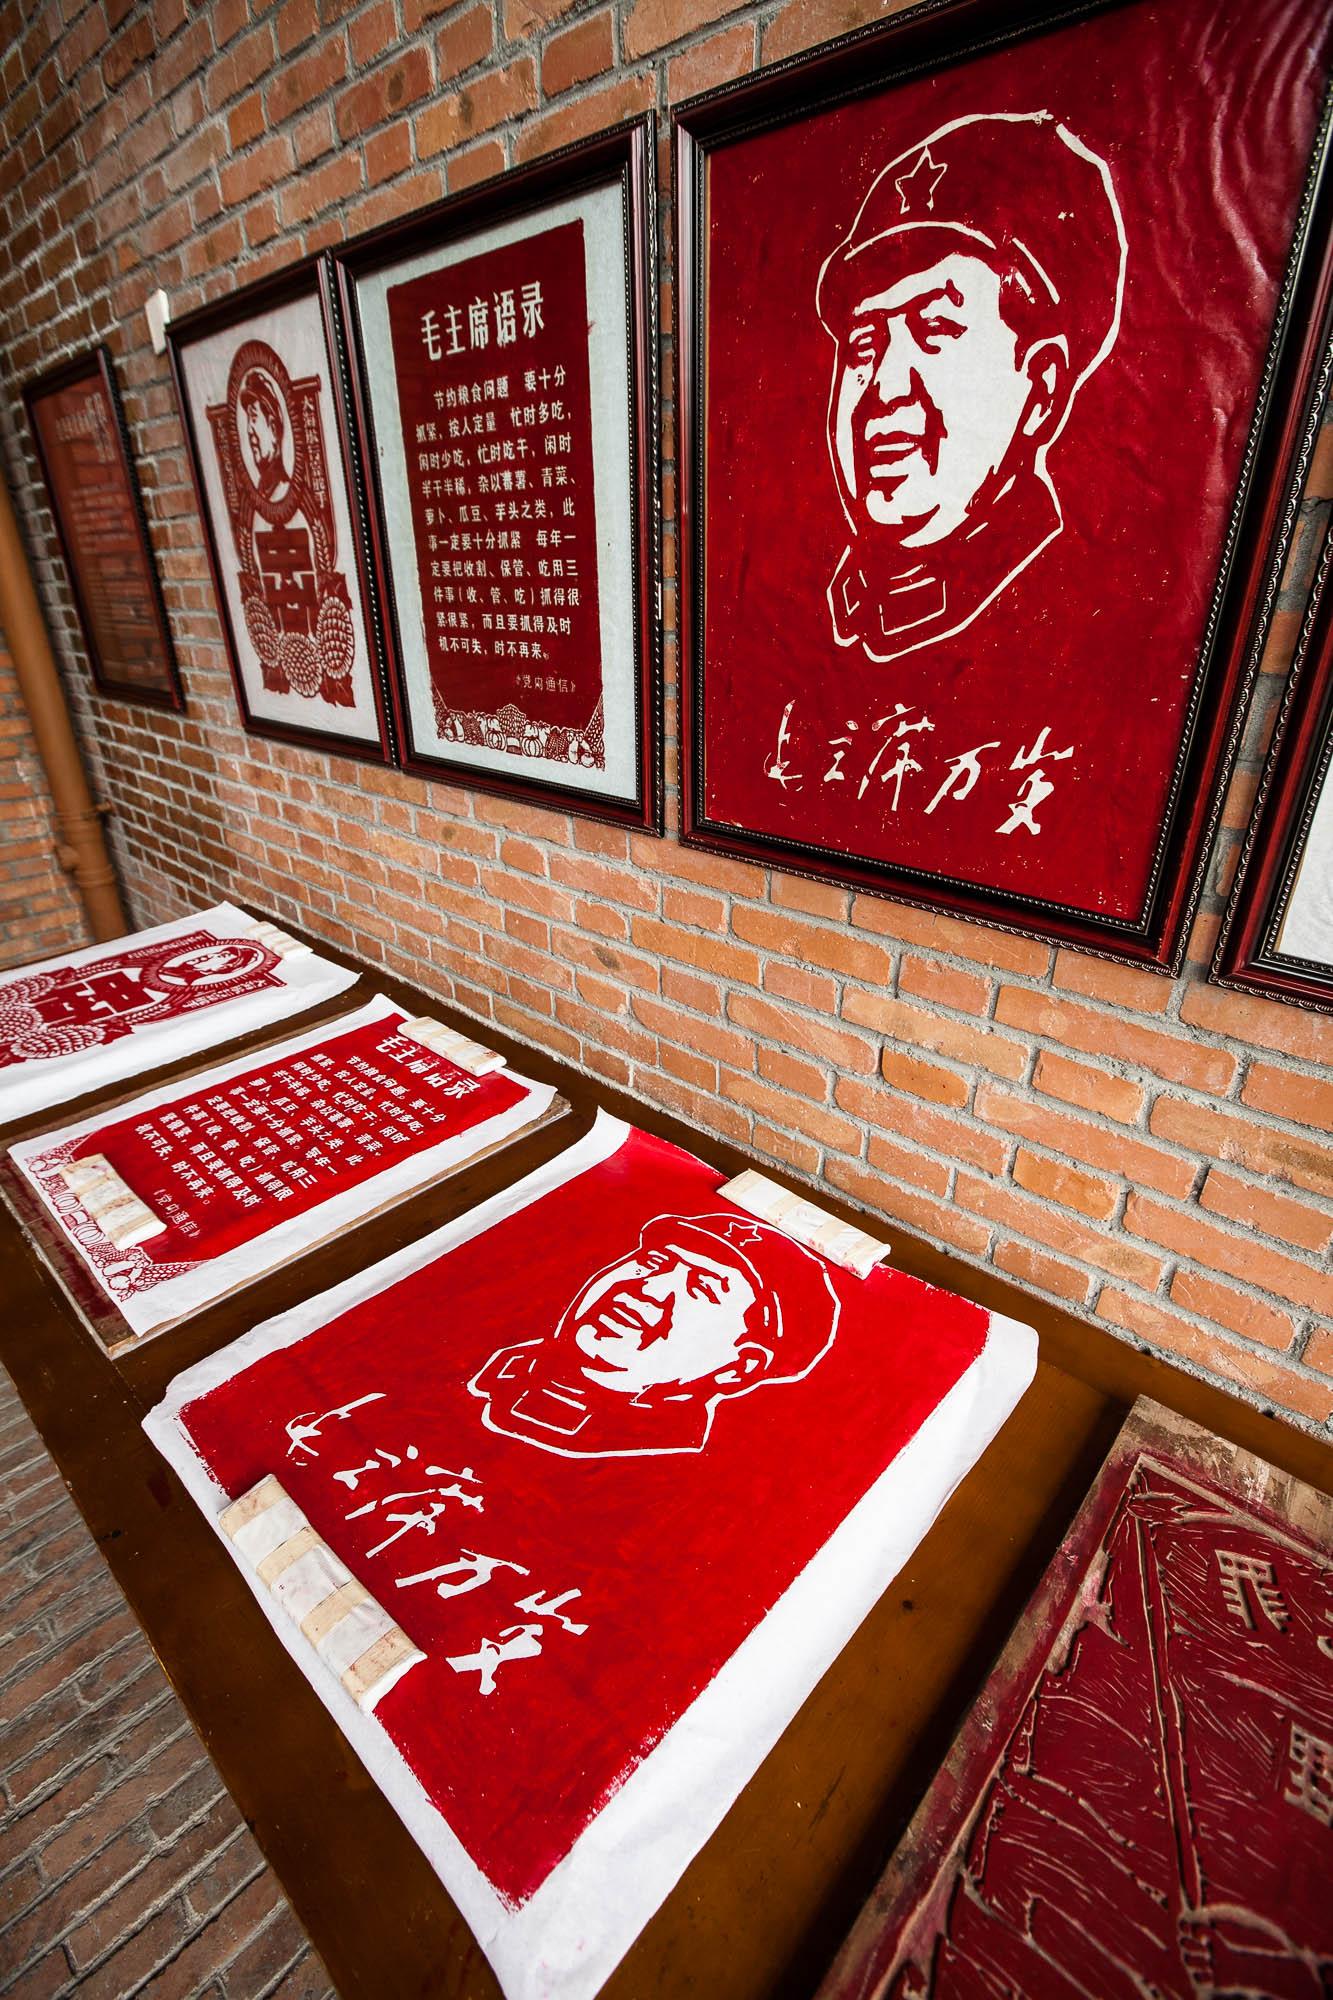 Maoist propaganda